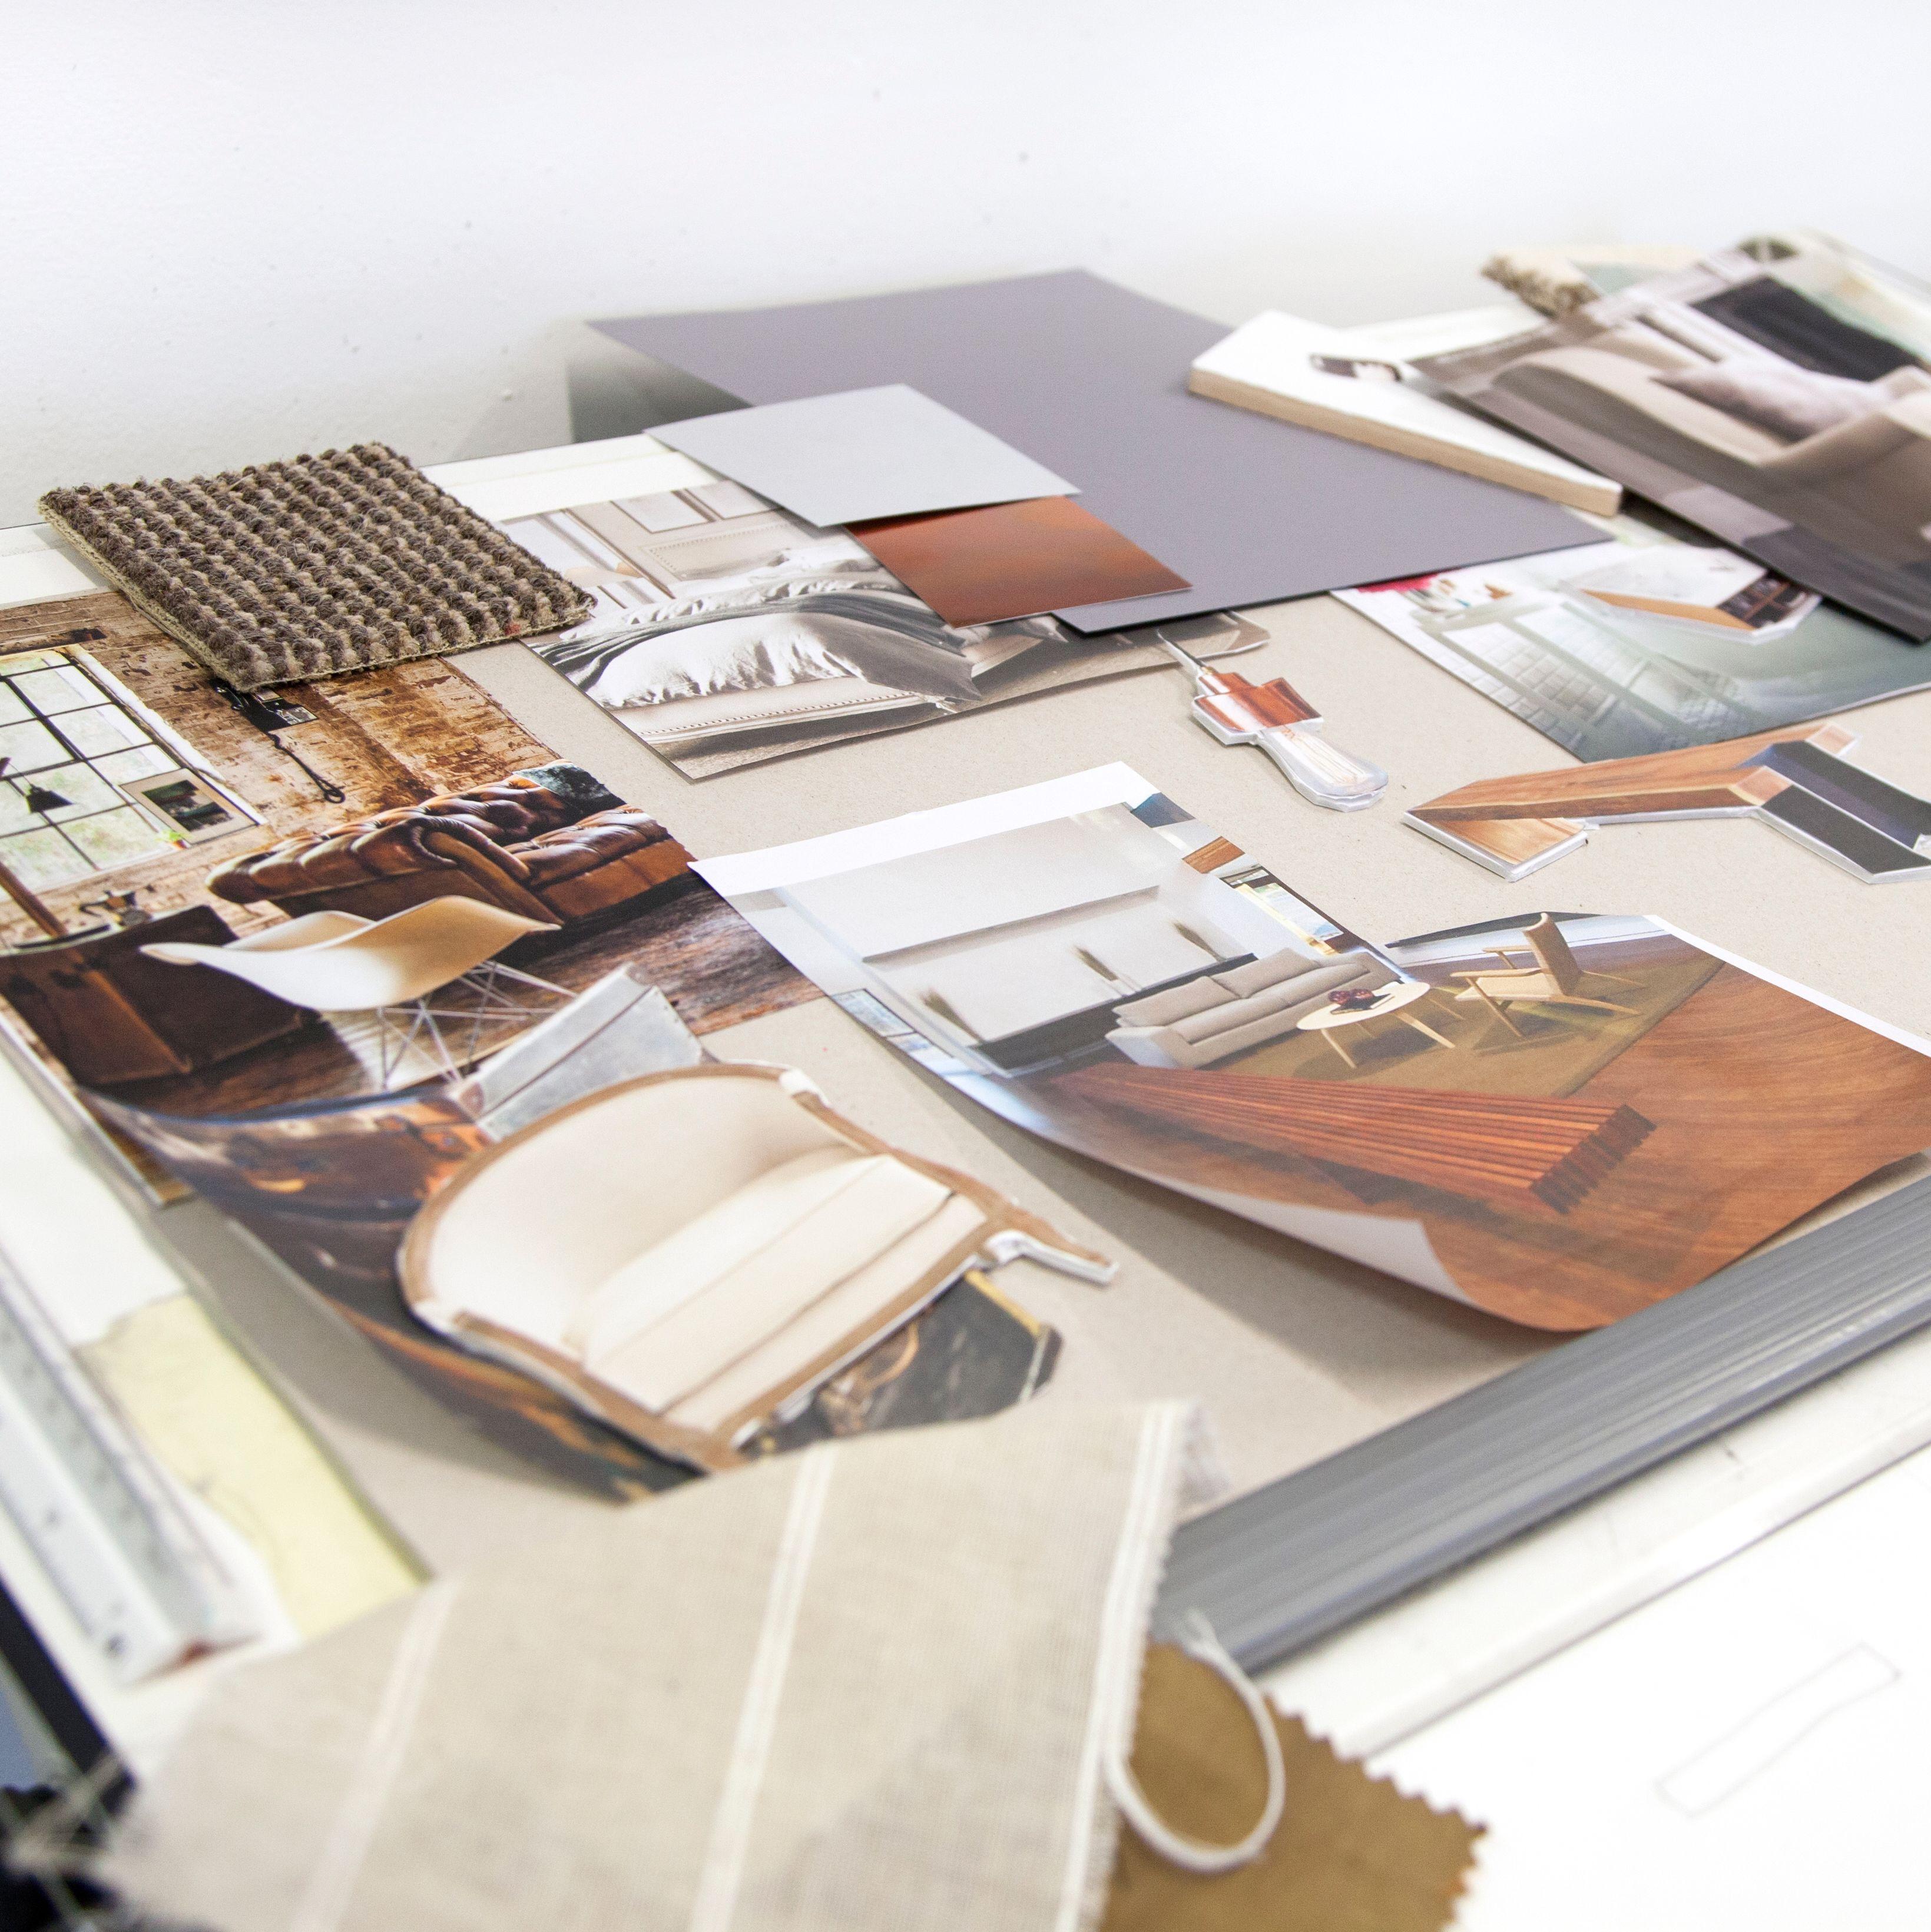 Work produced during an Interior Design short course